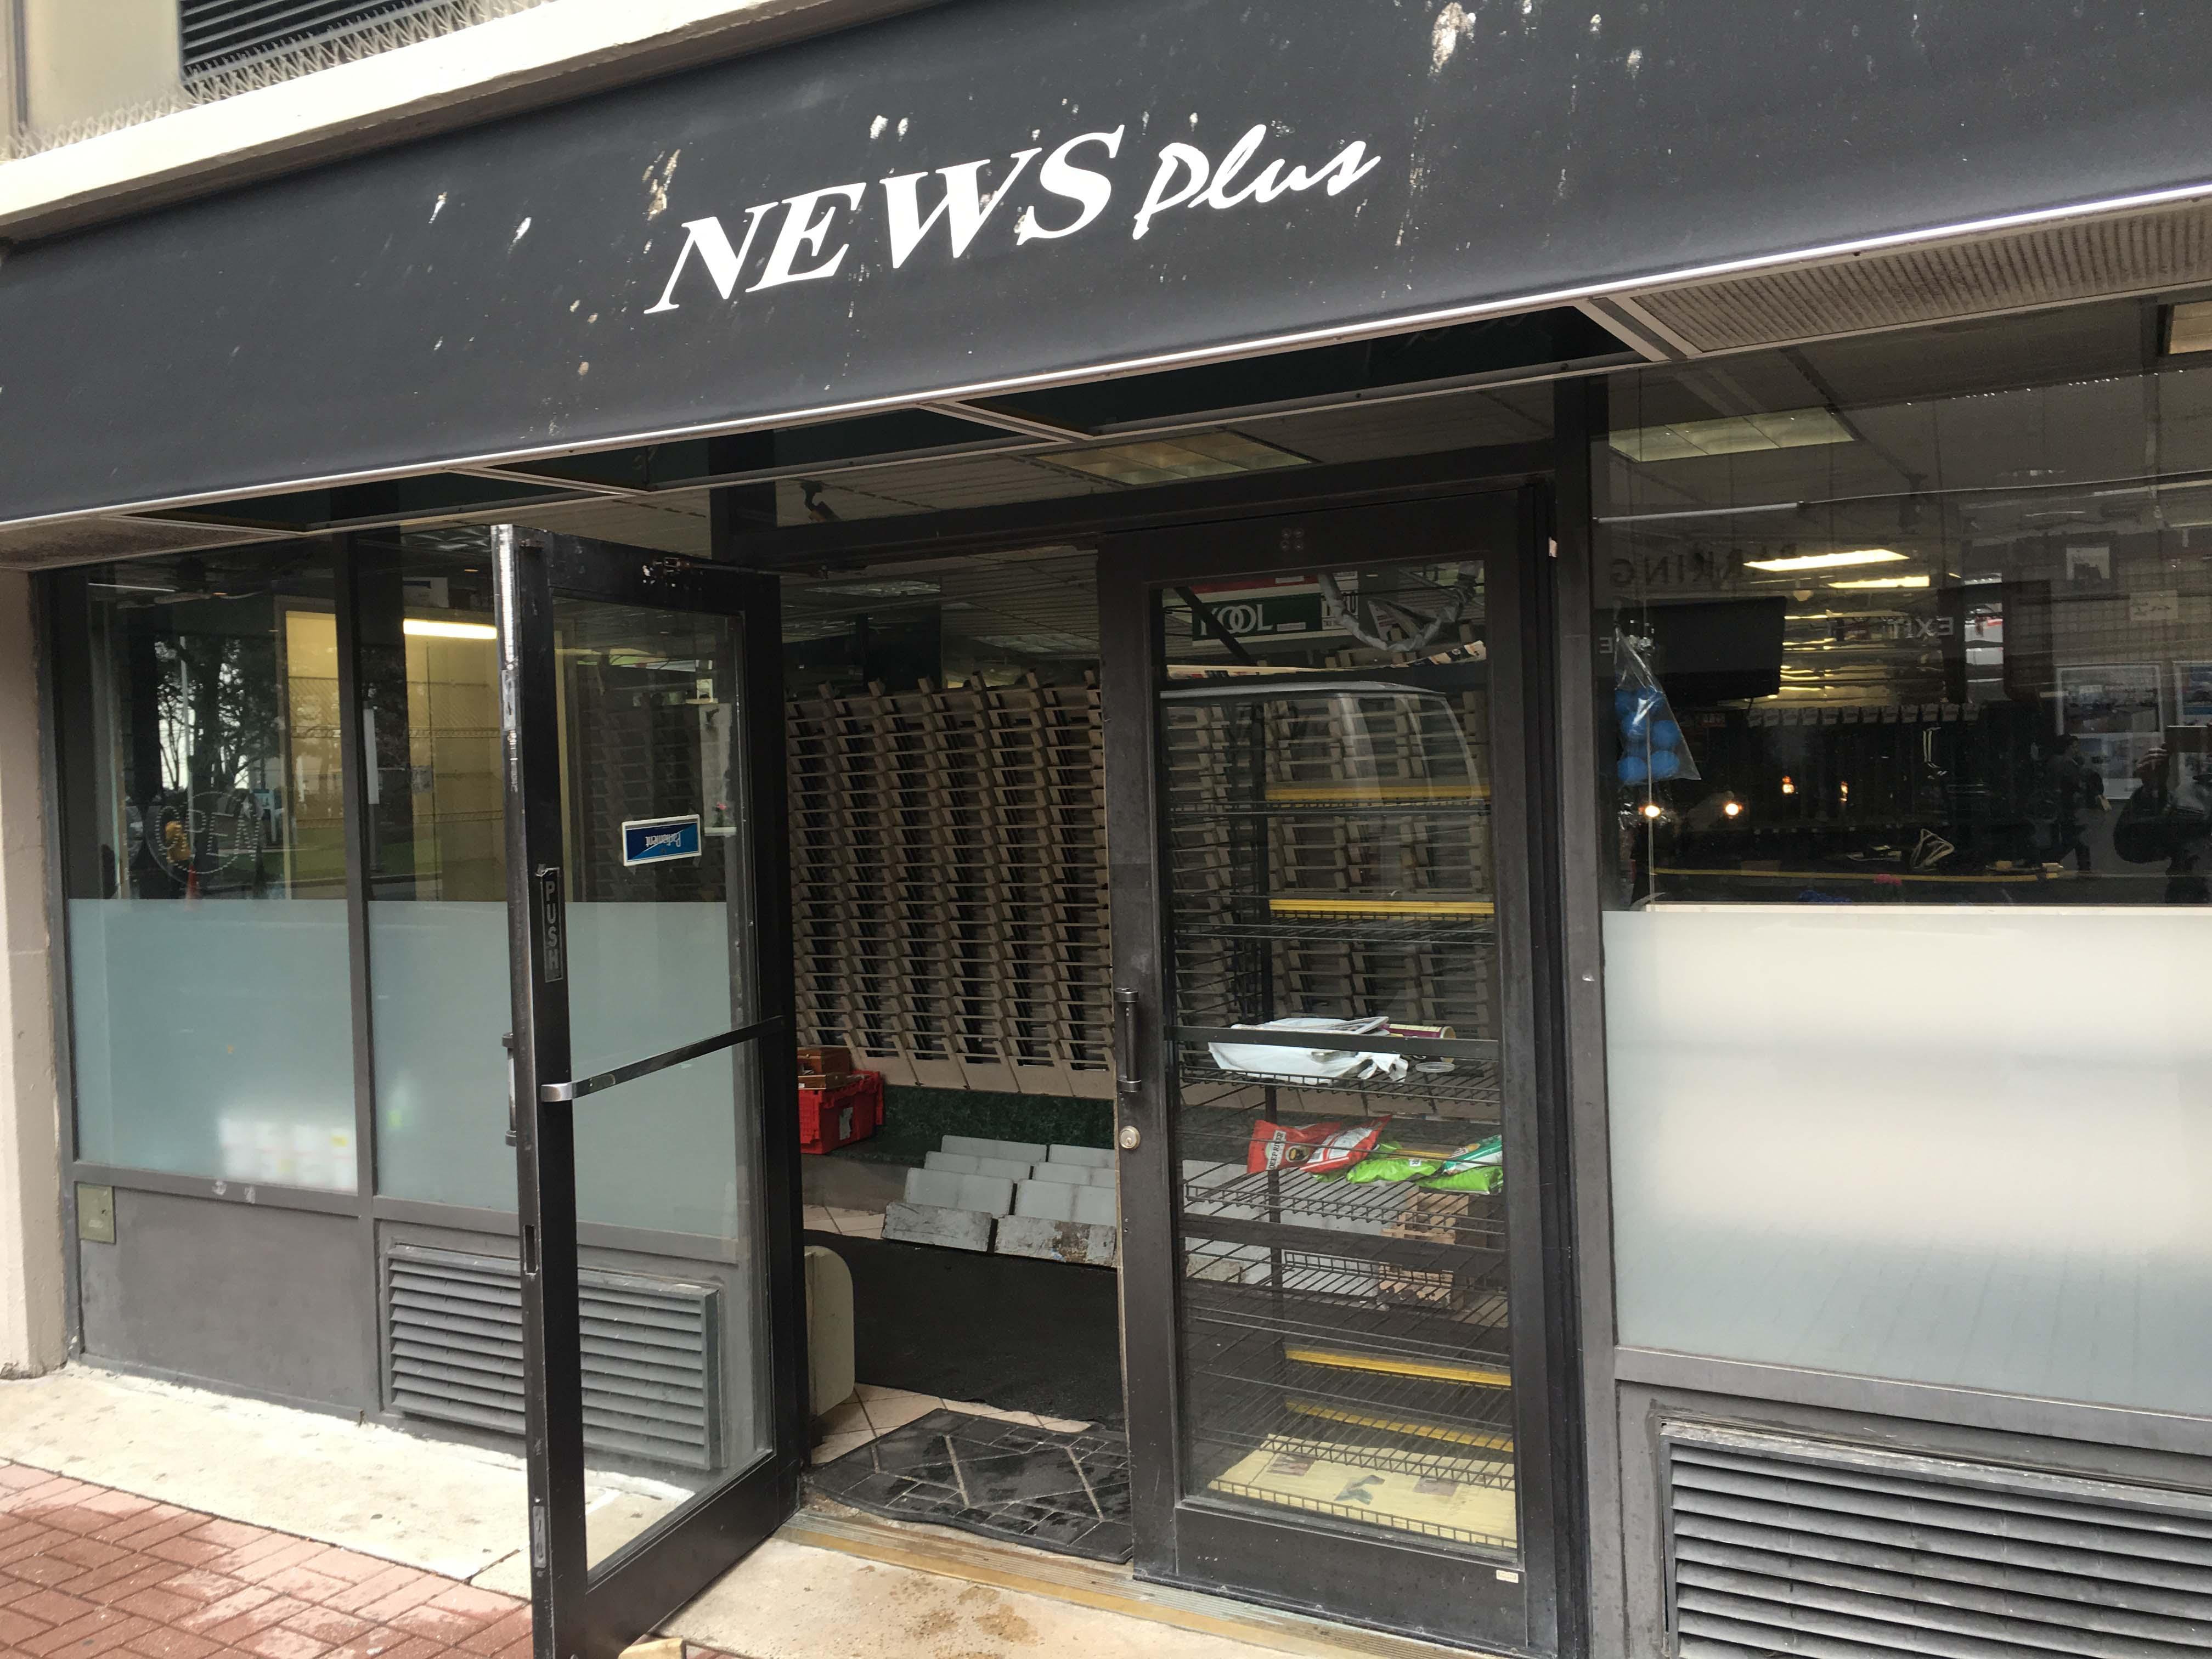 News plus gateway gone